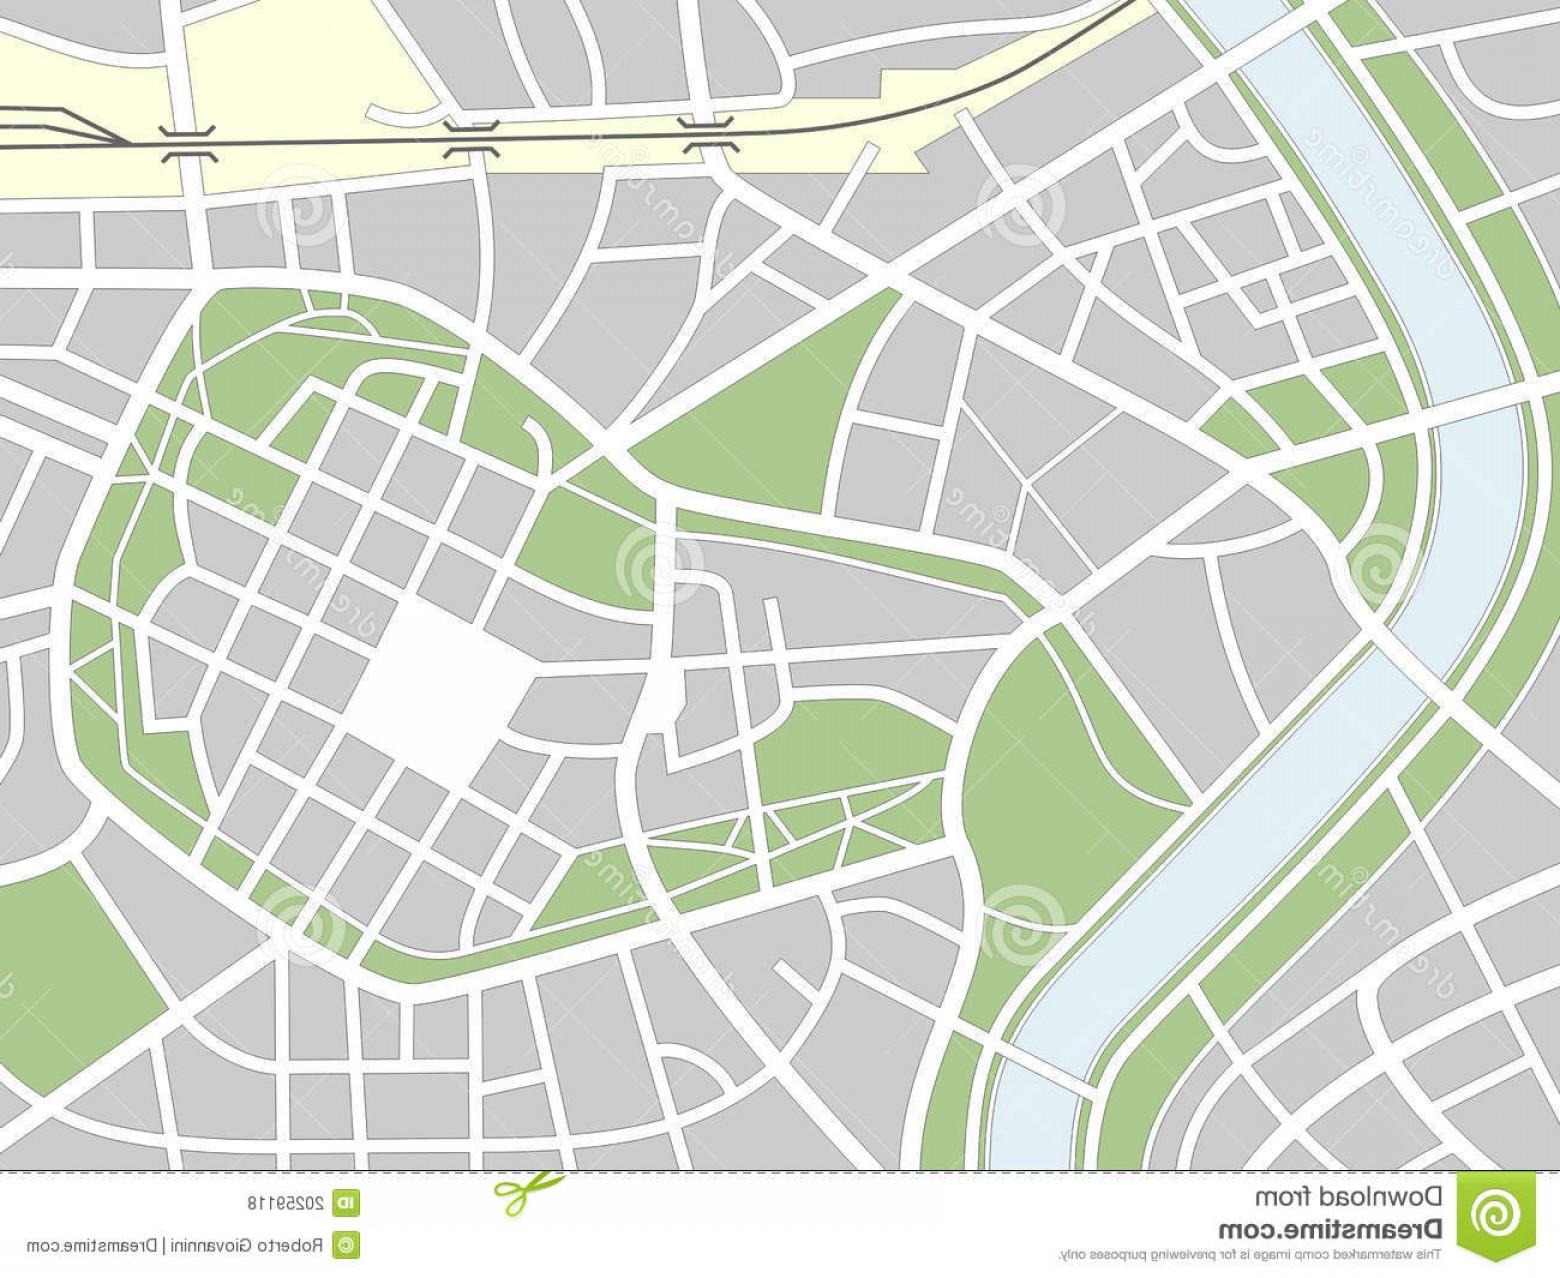 1560x1278 Royalty Free Stock Photos Nameless City Map Image Shopatcloth